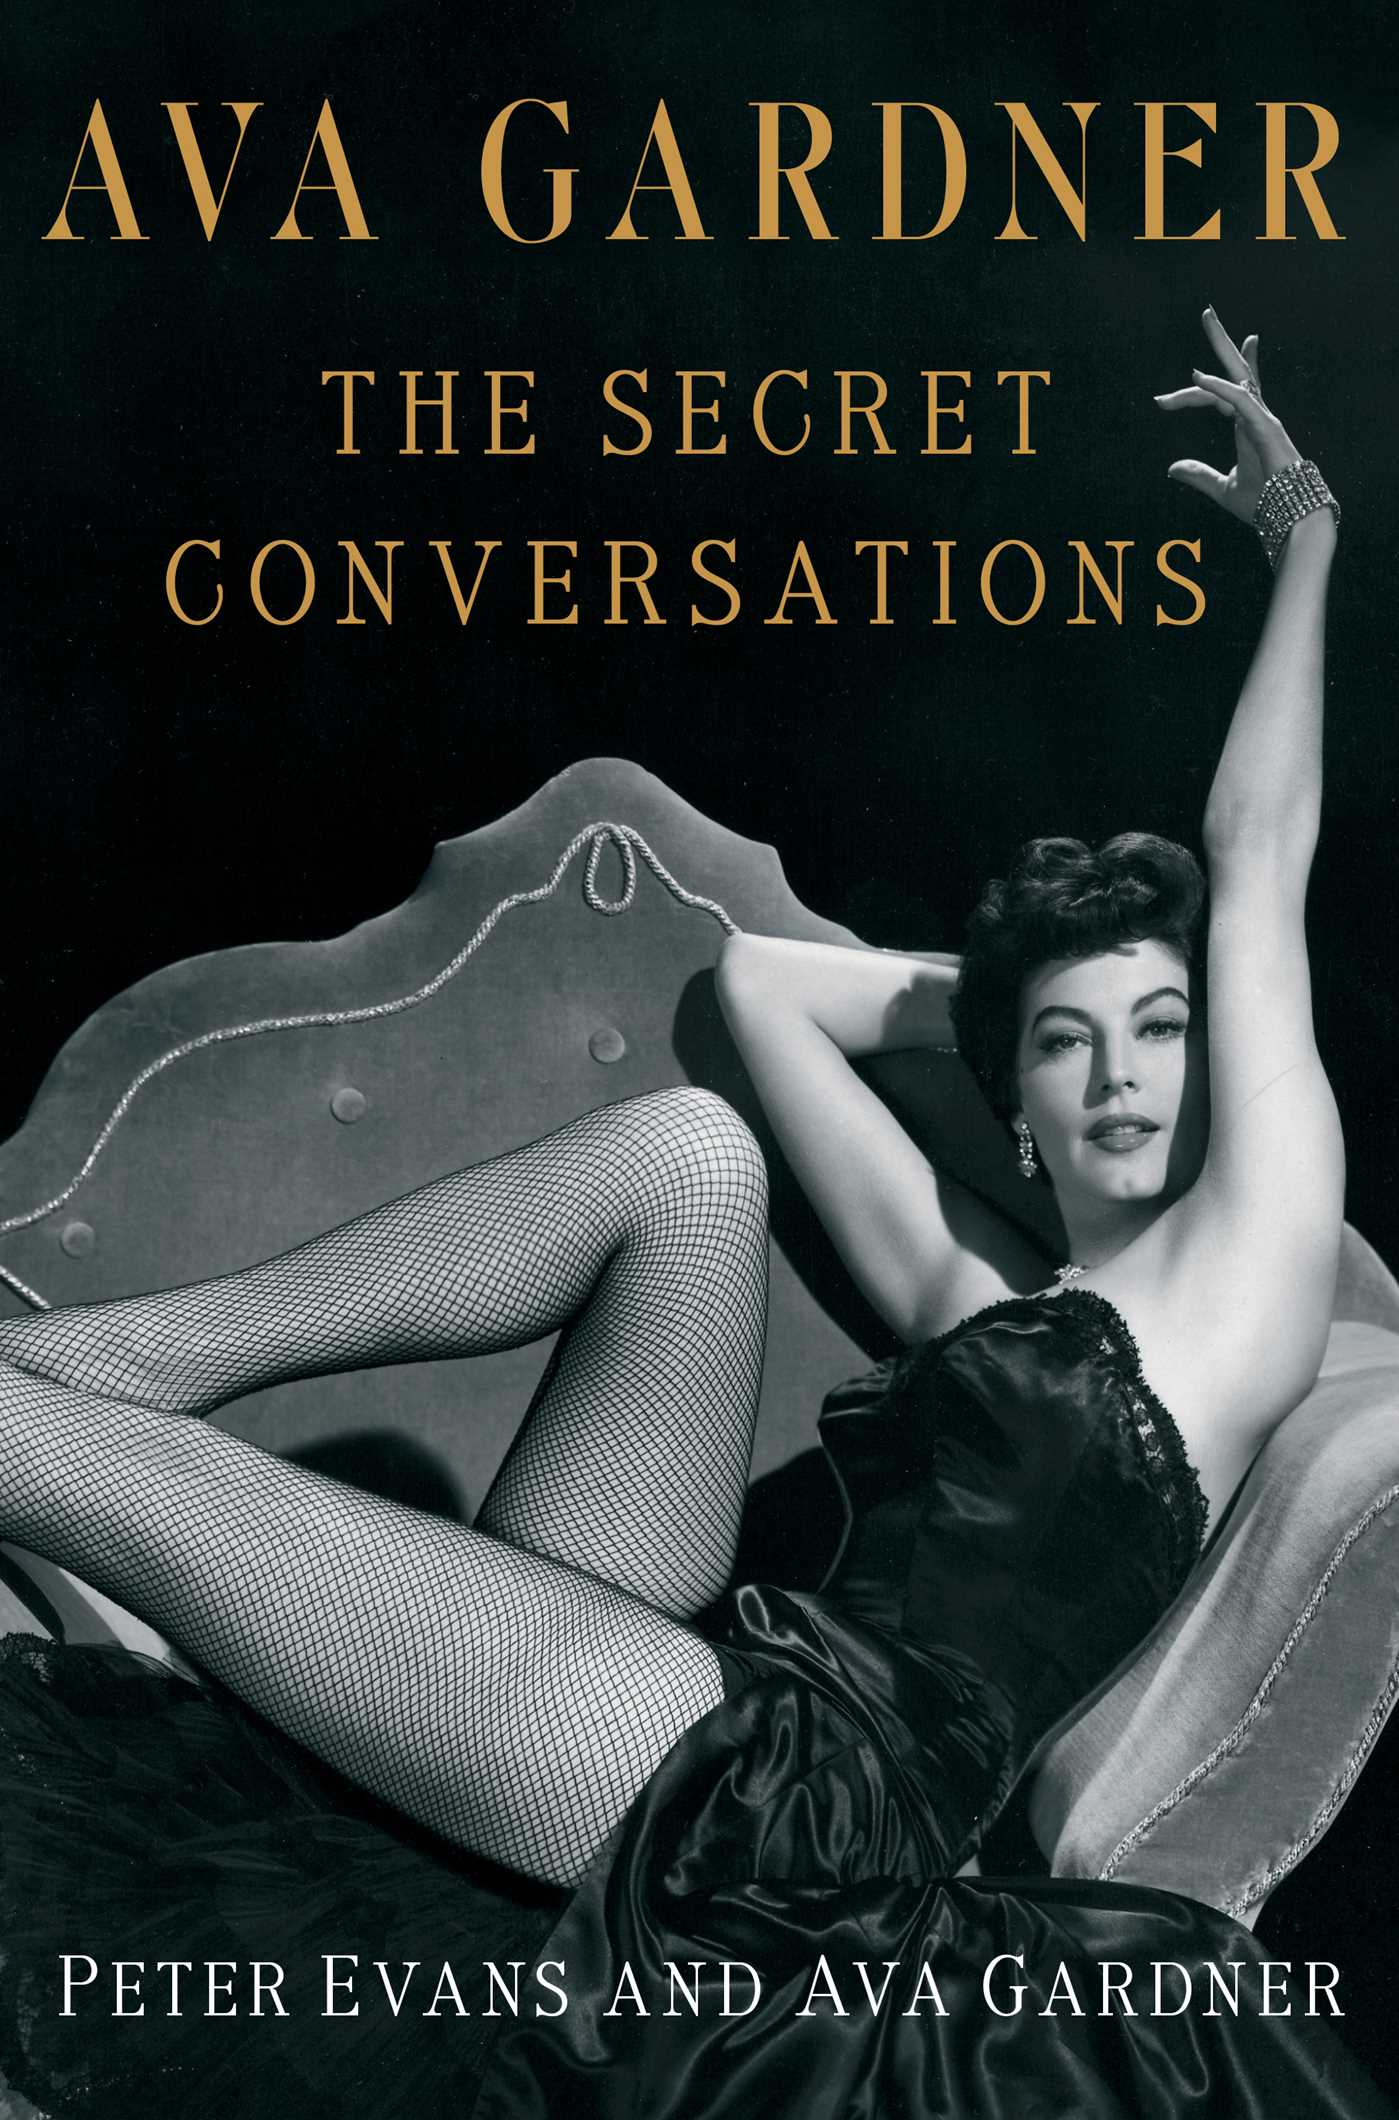 Ava gardner the secret conversations 9781451627718 hr